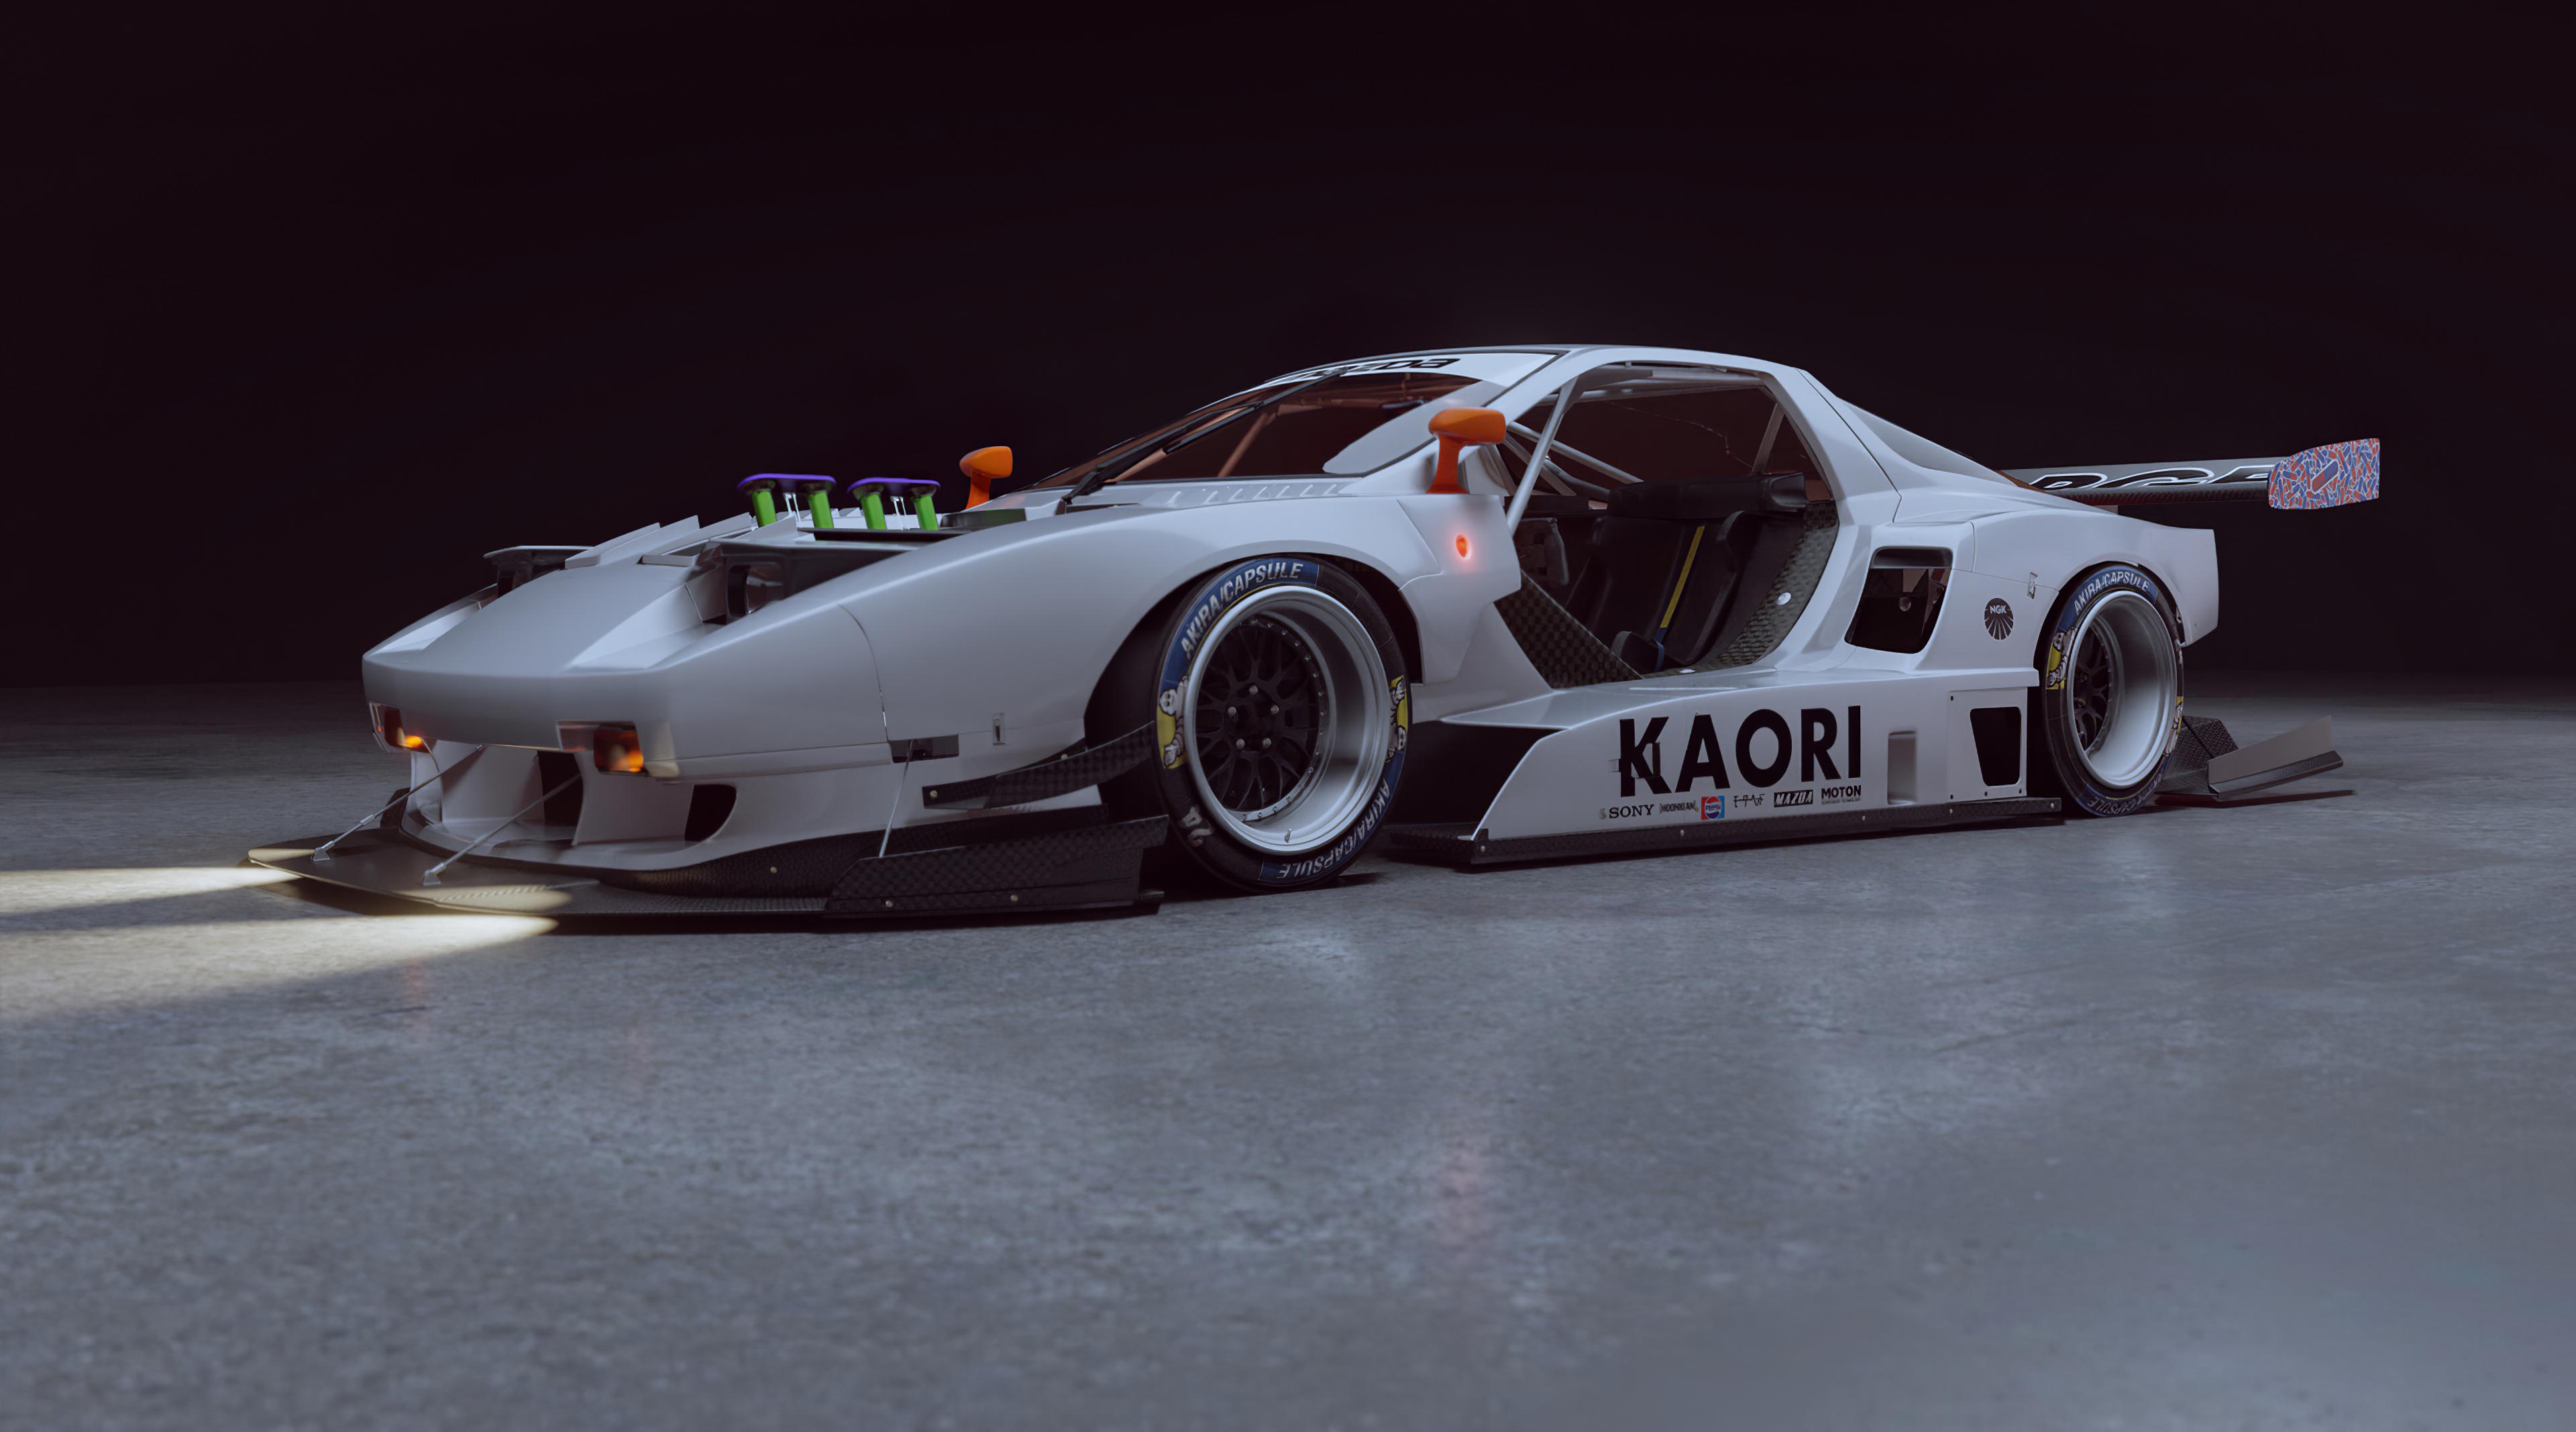 General 3840x2134 walter kim car race cars digital art white cars